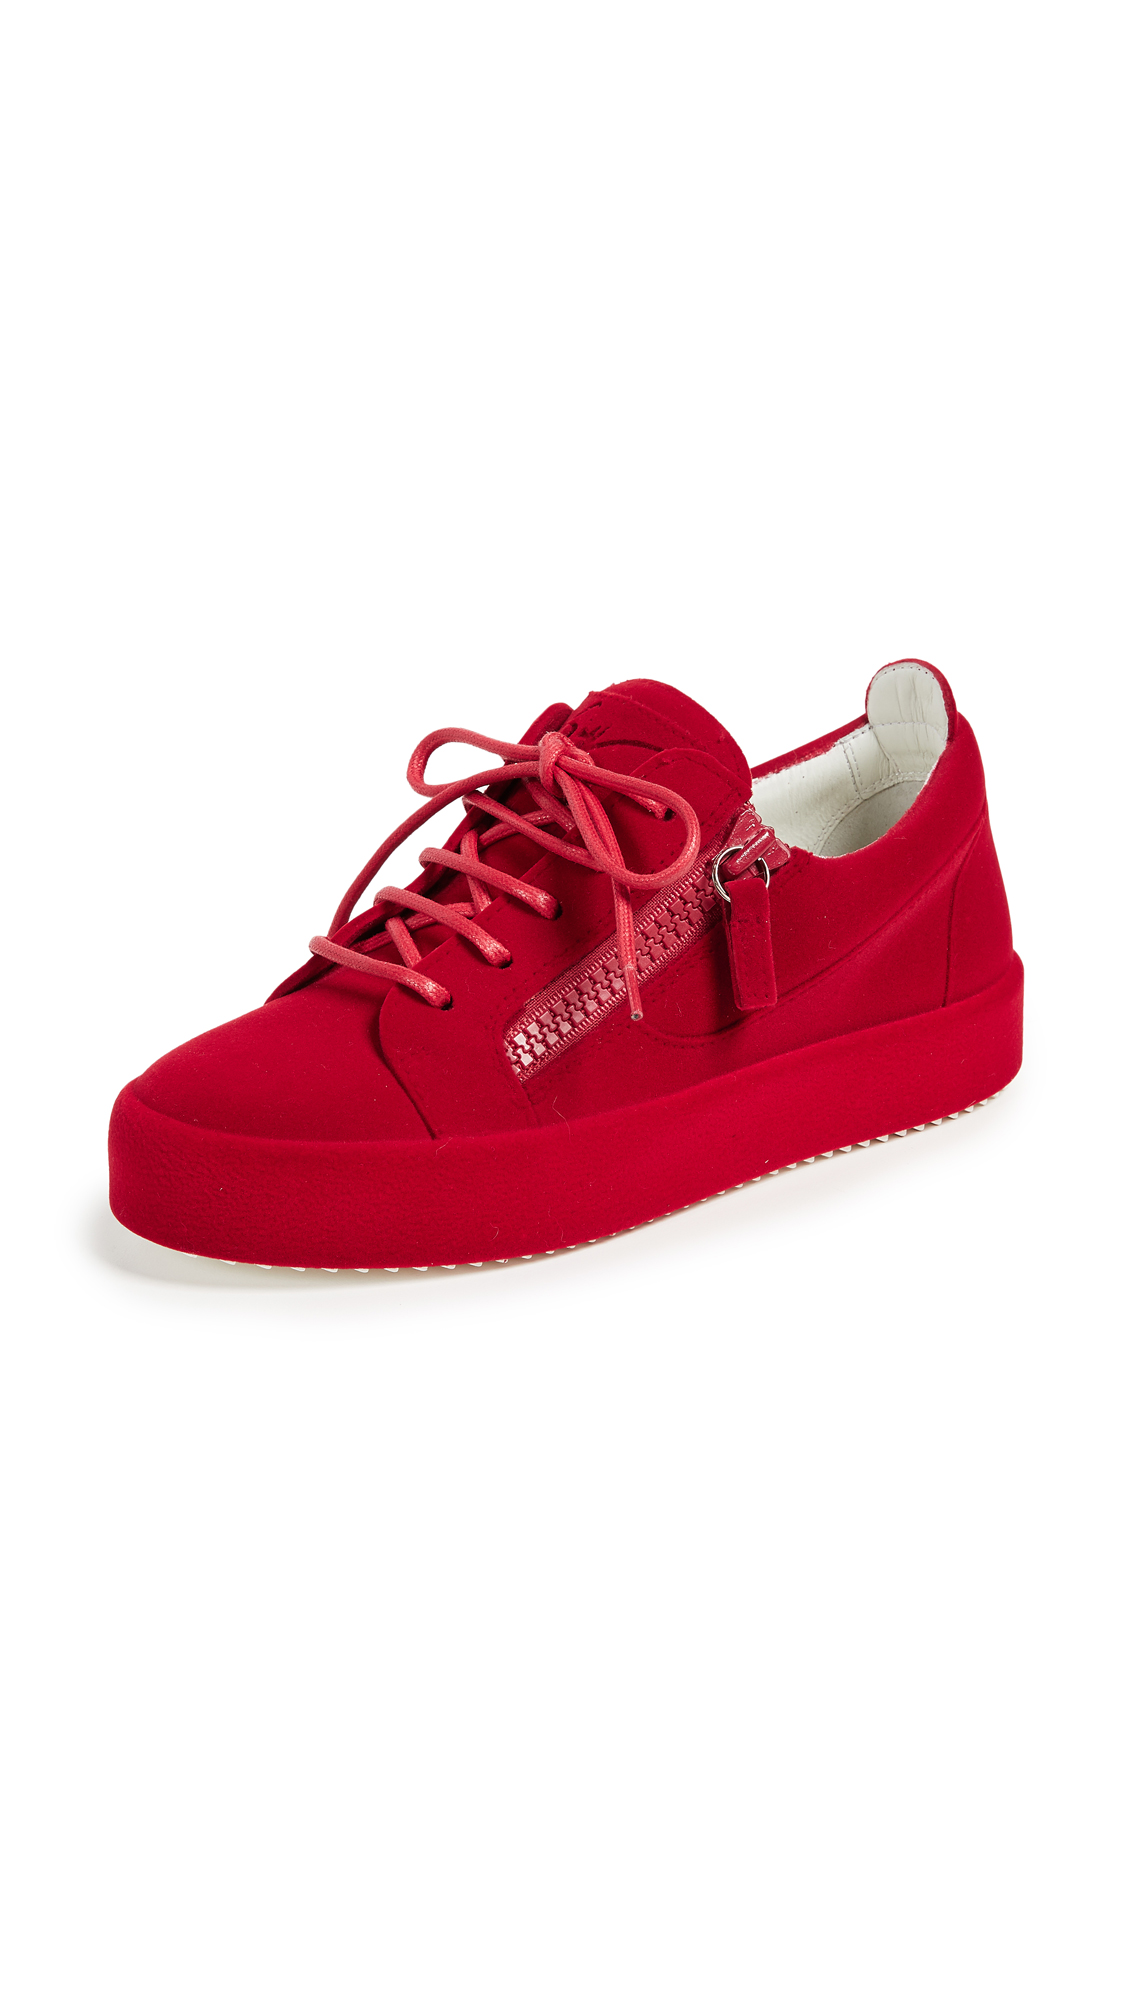 Giuseppe Zanotti Zip Sneakers - Red